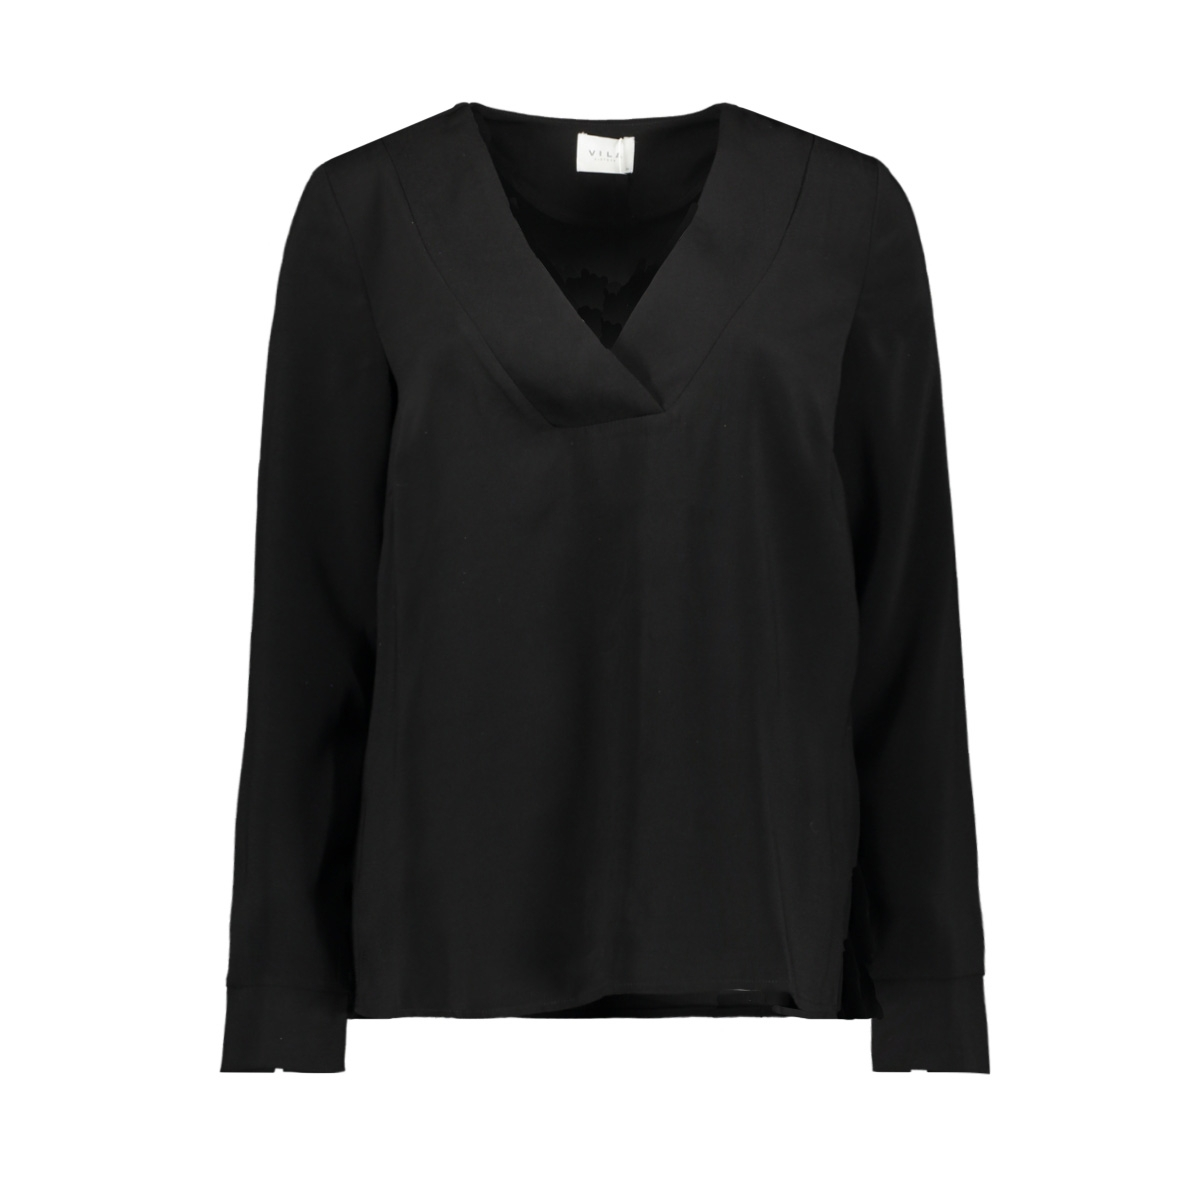 vilaia l/s v-neck top - noos 14053269 vila blouse black